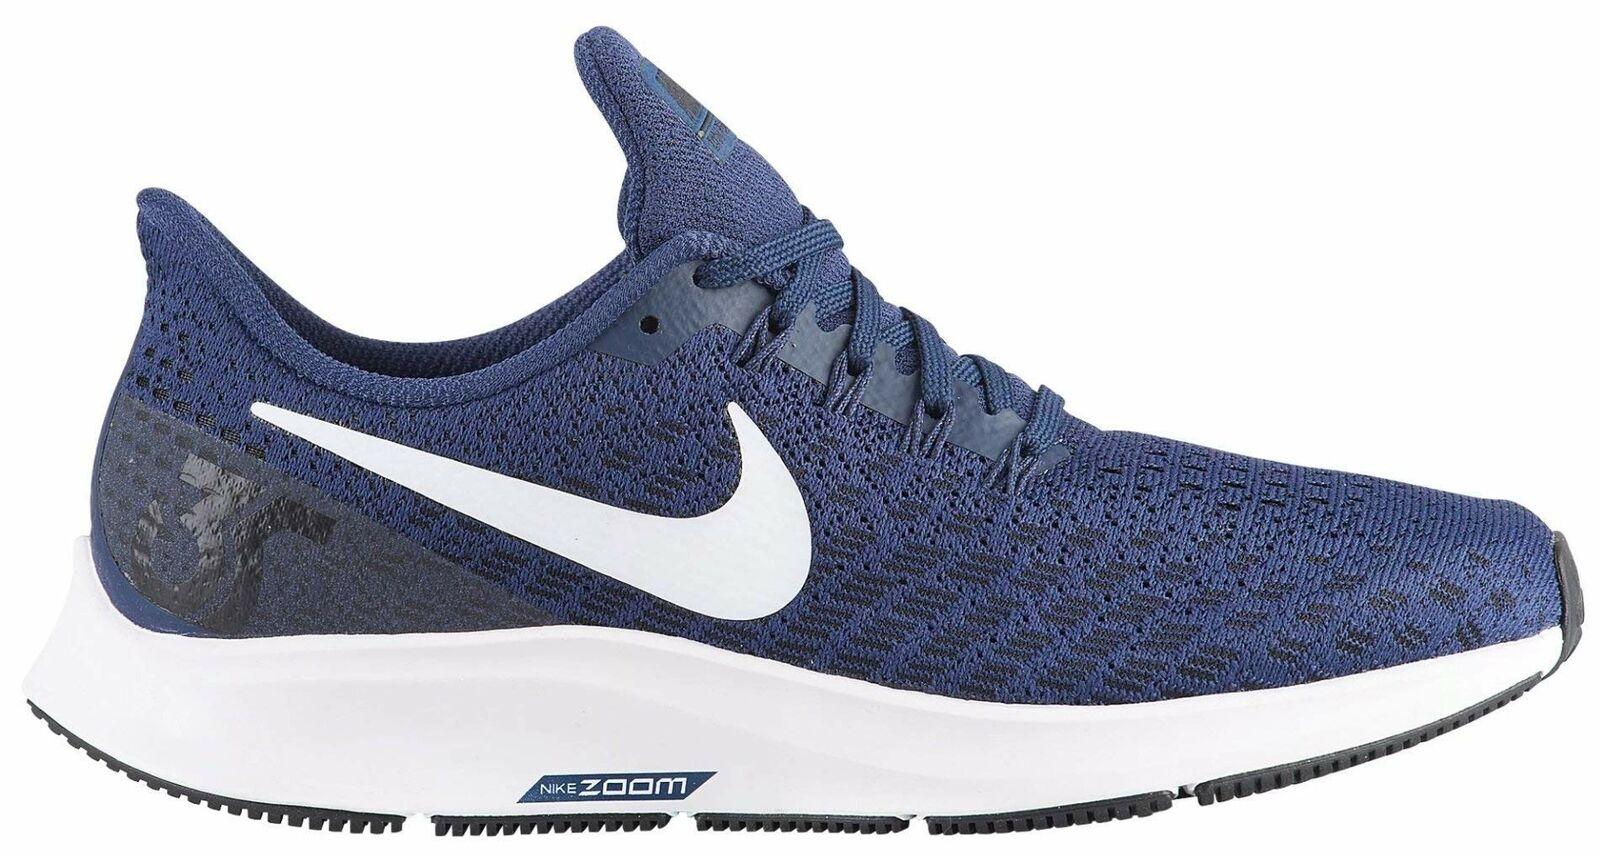 Nike W Nike AIR Zoom PEGASUS 35 TB, MIDNIAKT MIDNIAKT MIDNIAKT NAVY  VITE -BLAKK, 6  70% rabatt billigt